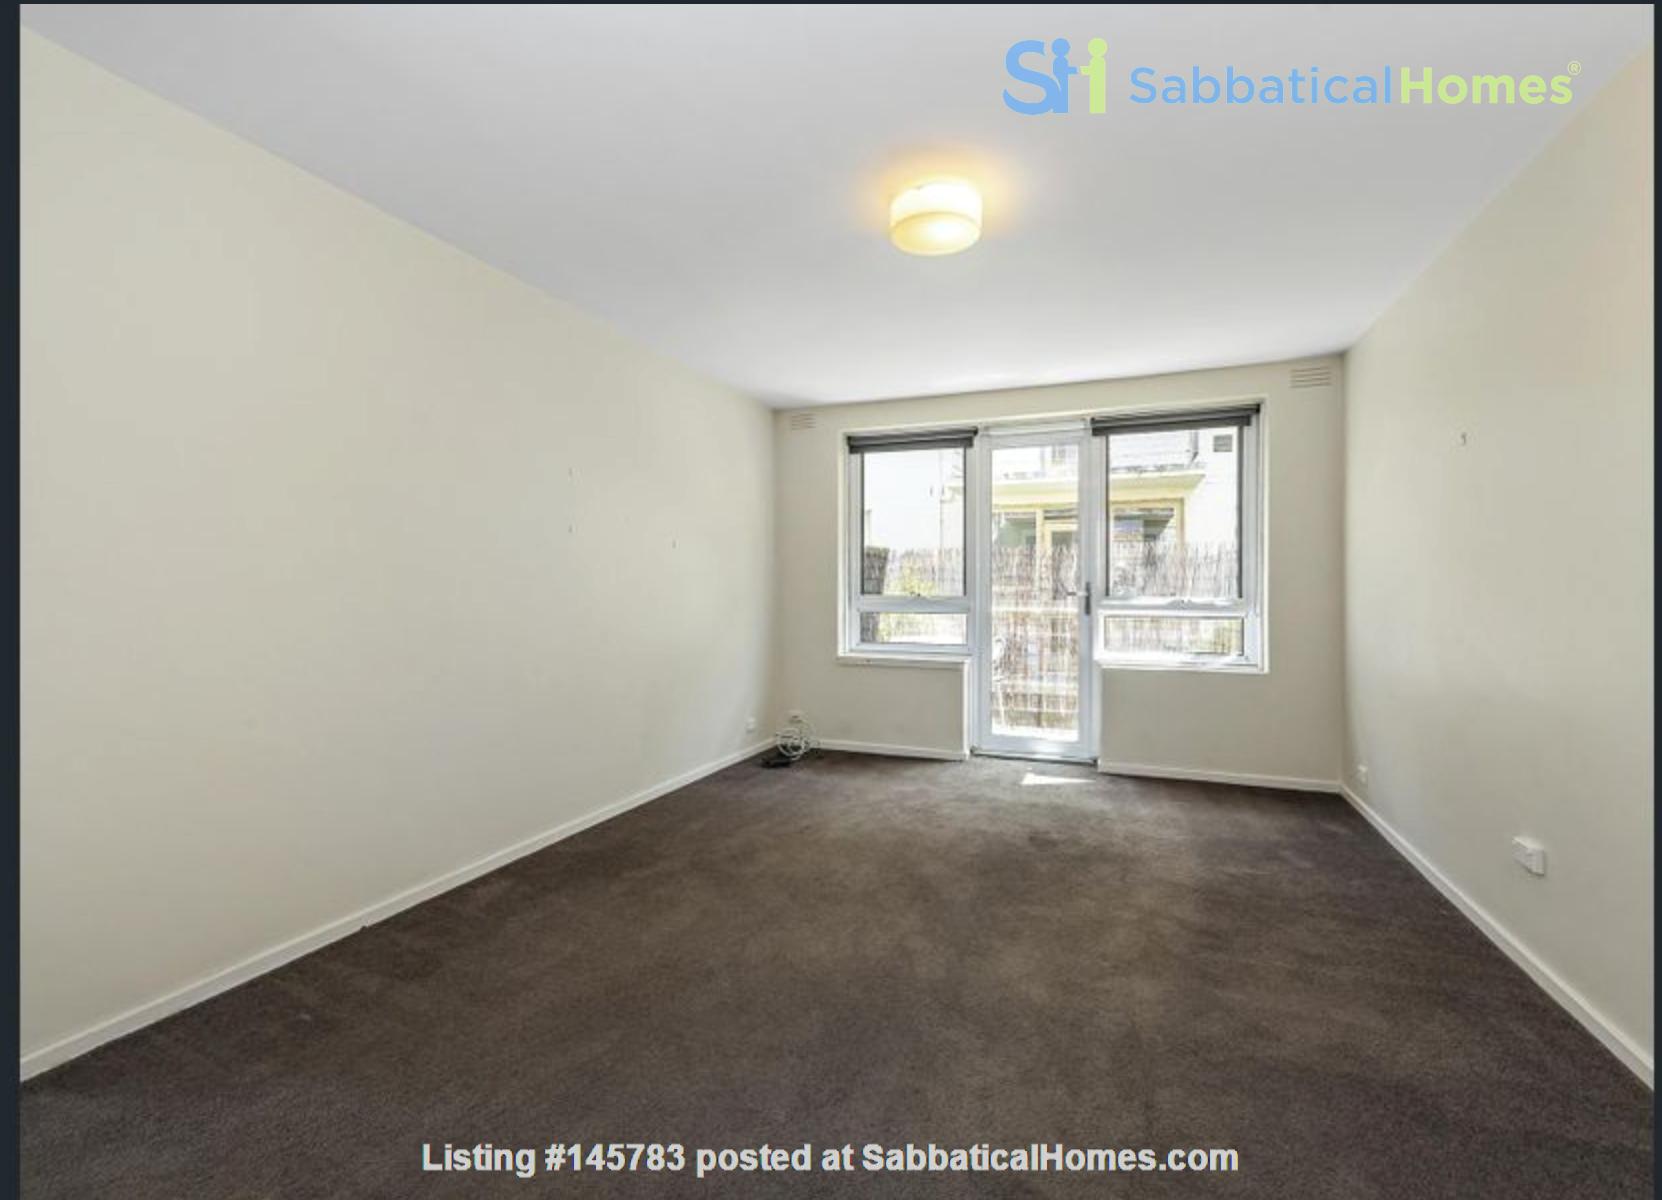 2 bedroom apartment in inner city Melbourne Home Rental in St Kilda East 1